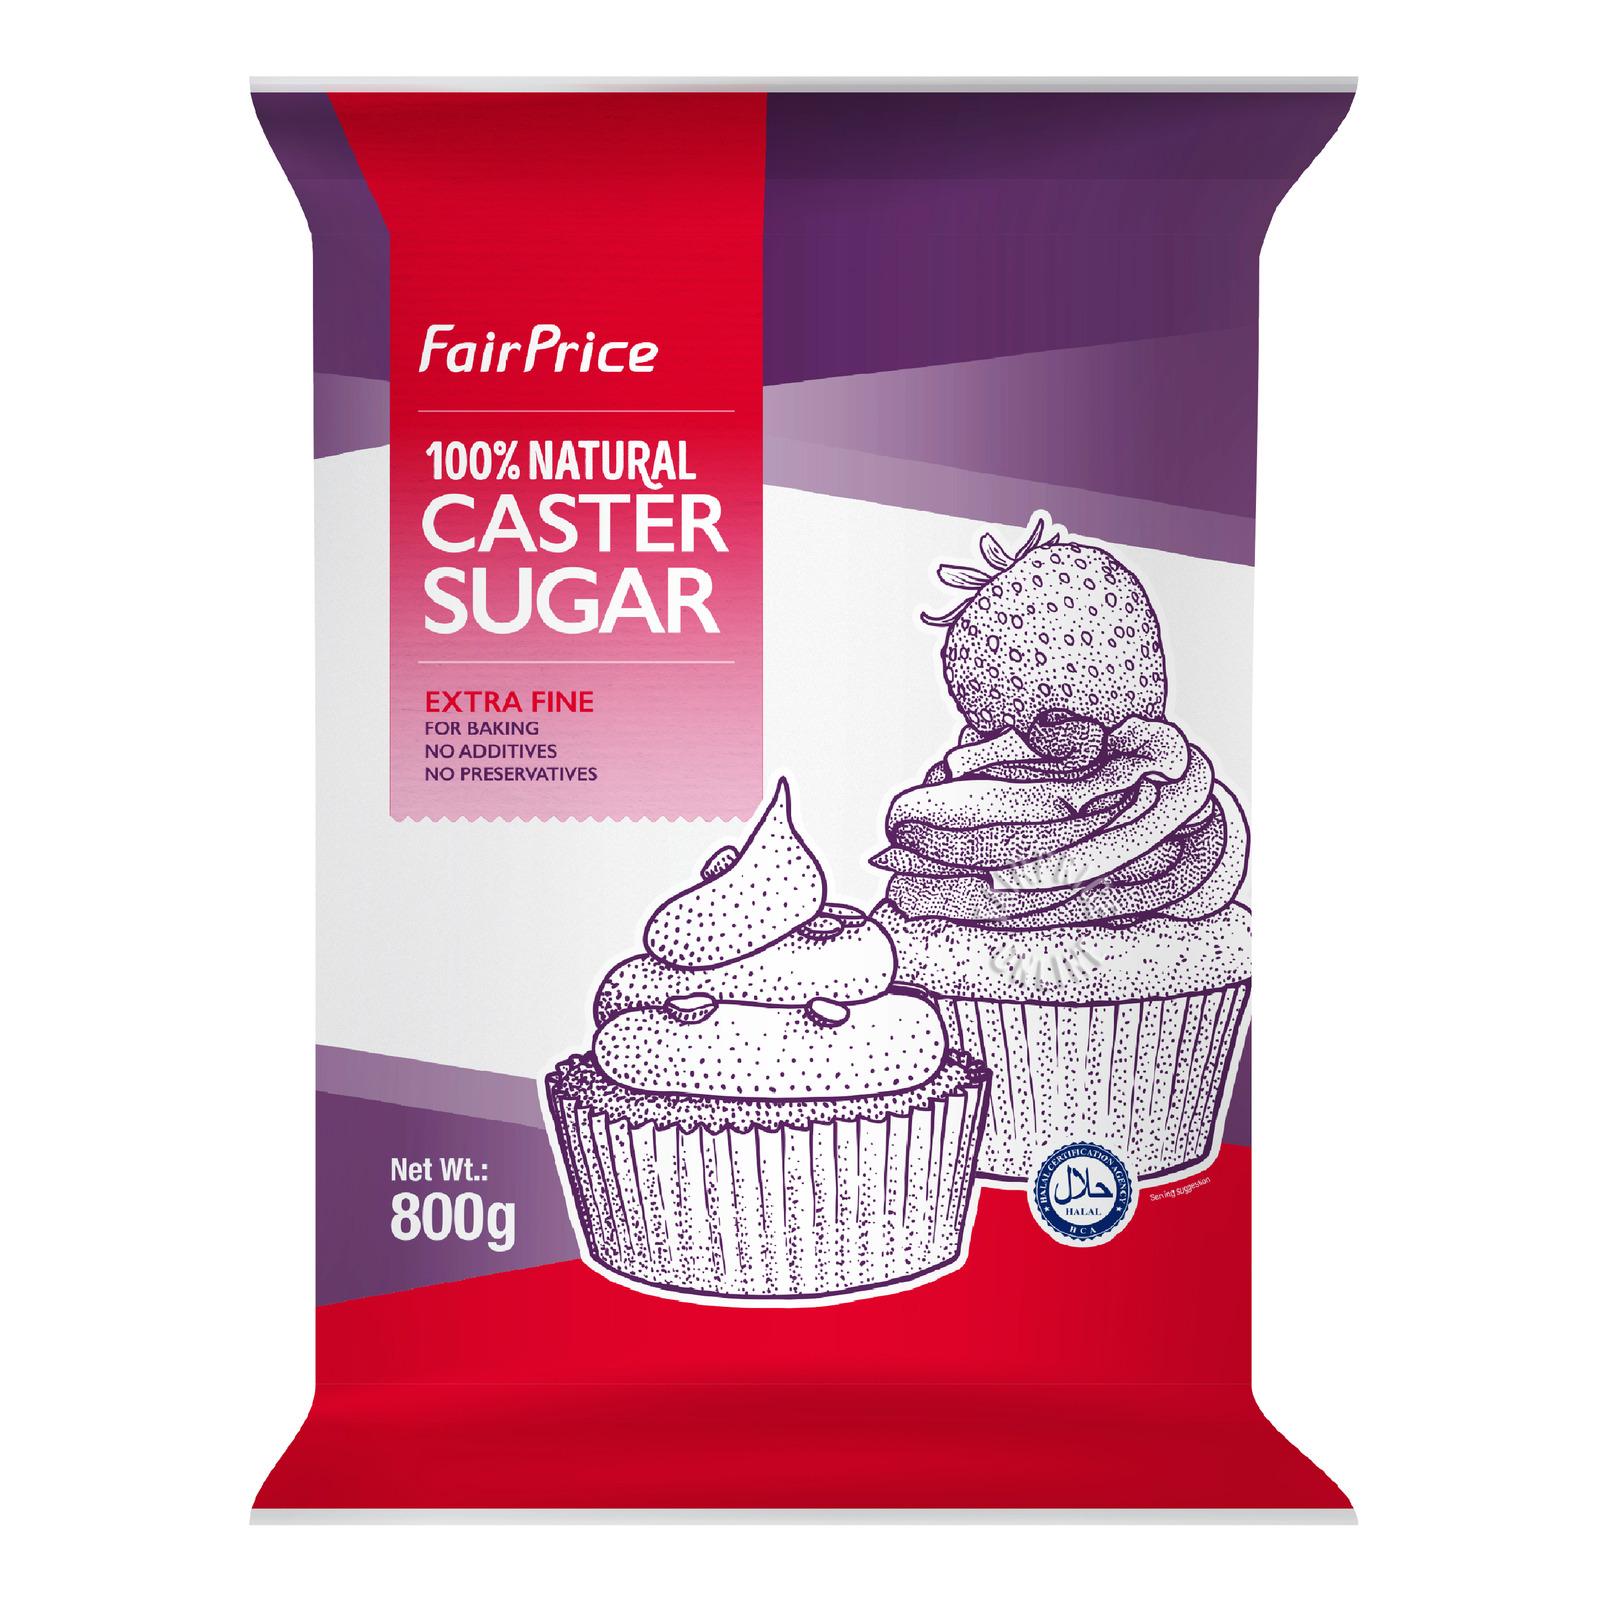 FairPrice 100% Natural Caster Sugar - Extra Fine